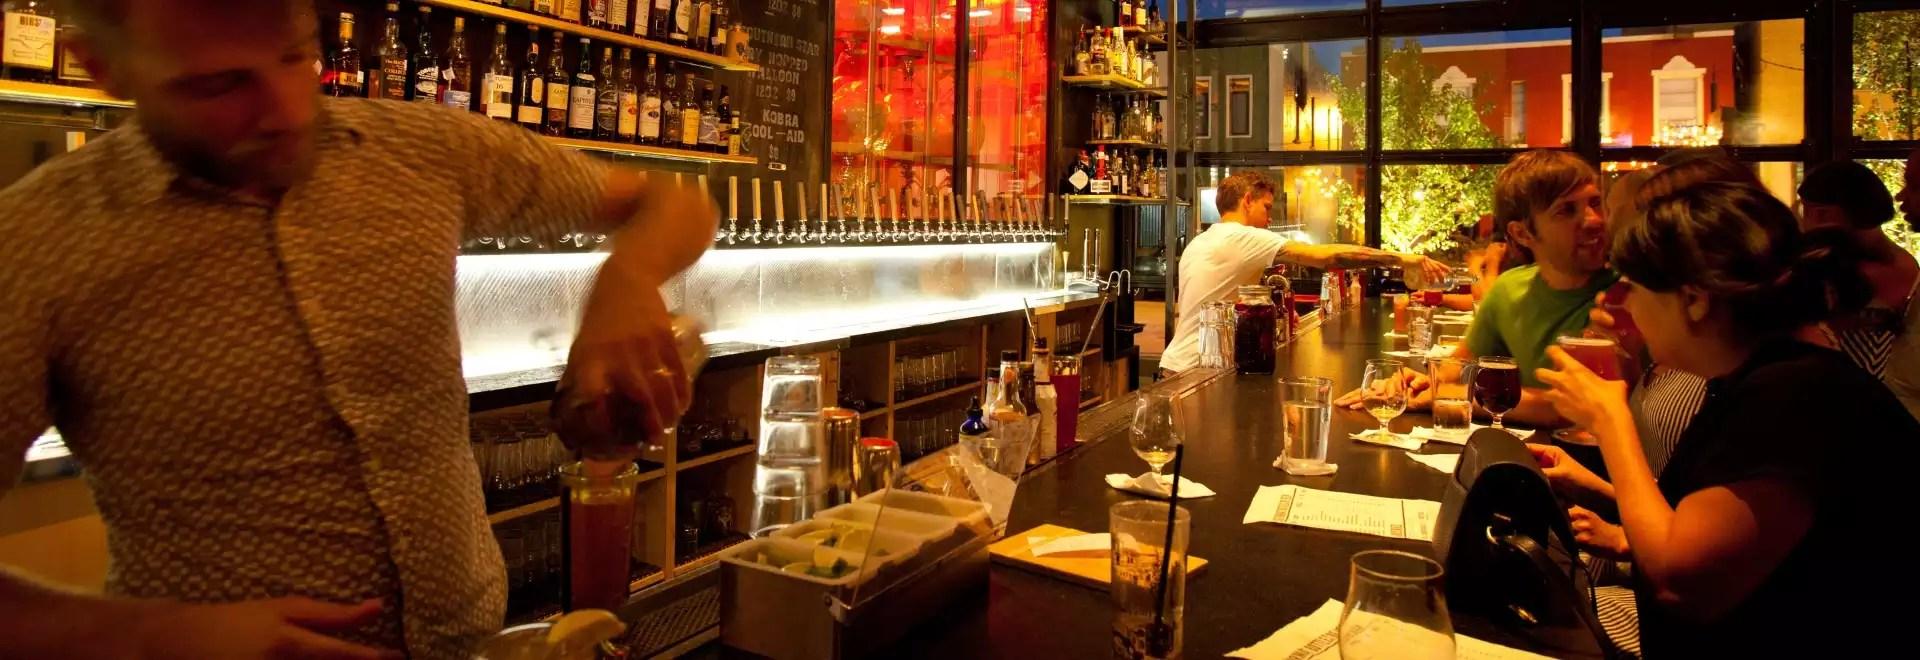 Secret Bars in Houston  Underground Hidden Bars  Clubs